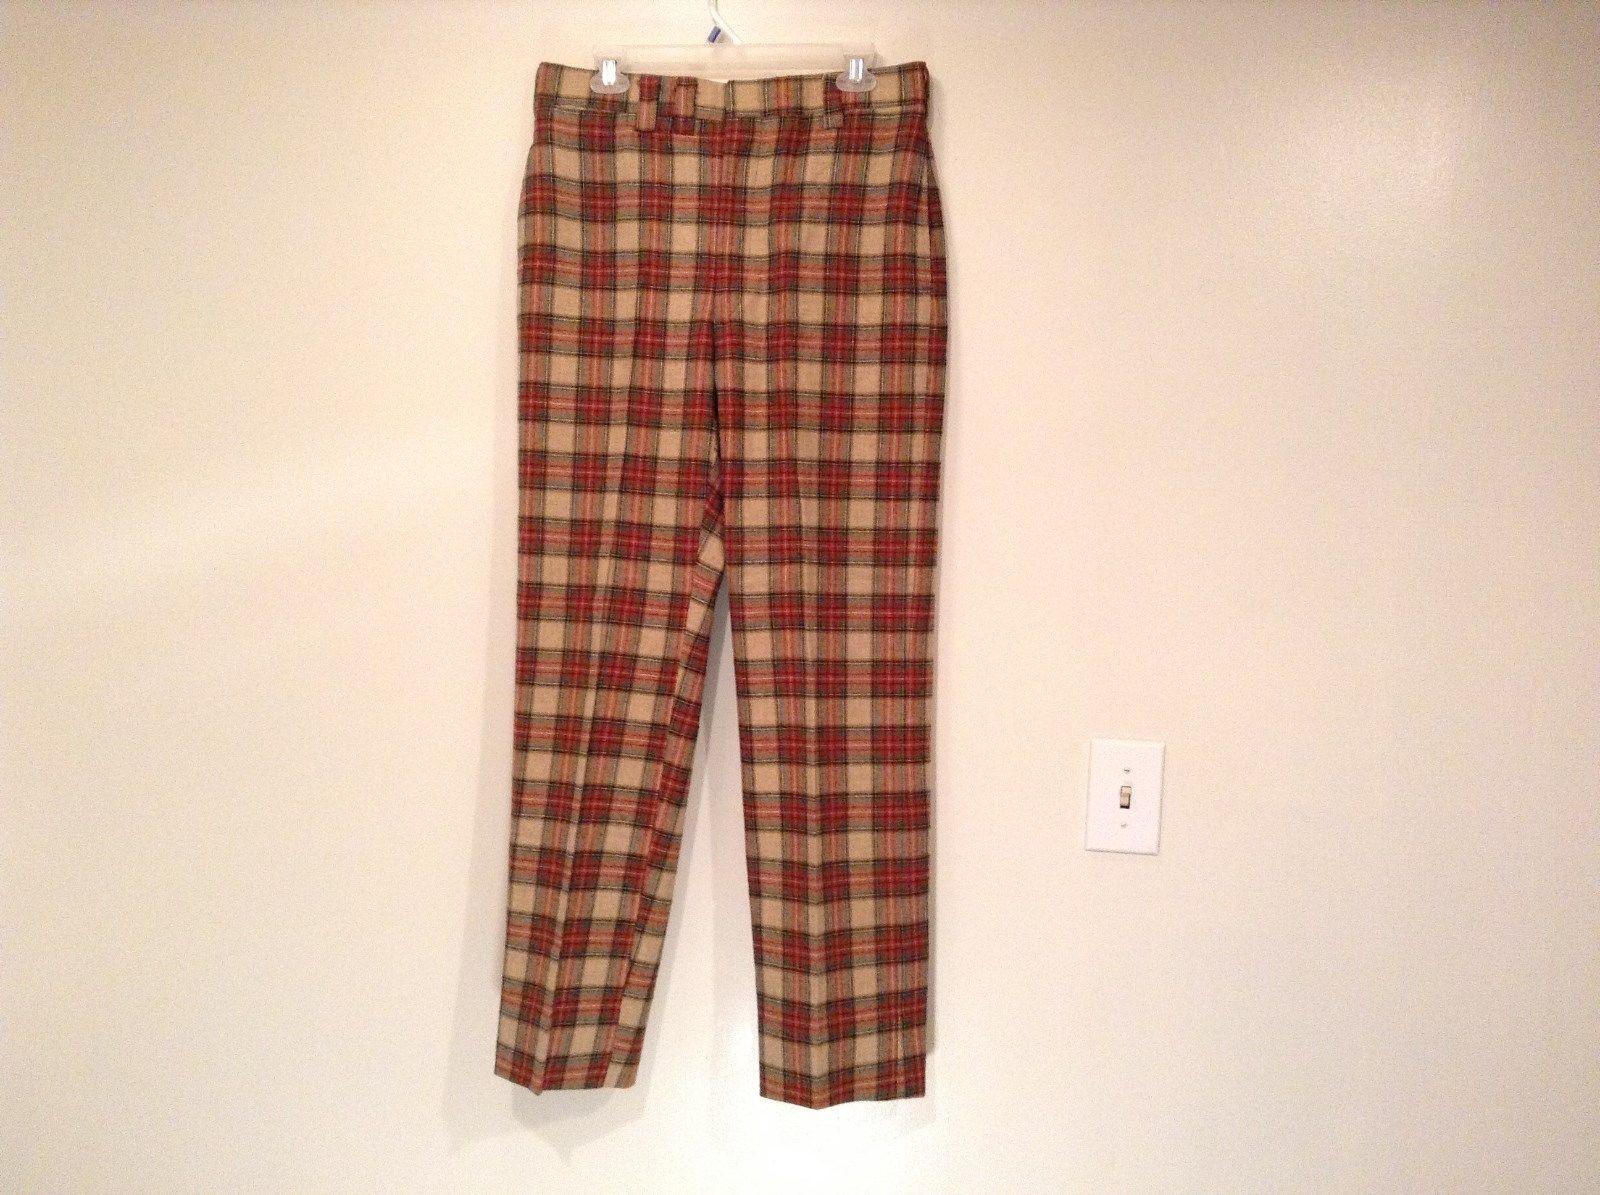 100 Percent Wool Tan Brown Red Dark Green Plaid Pants Richard Oliver No Tag